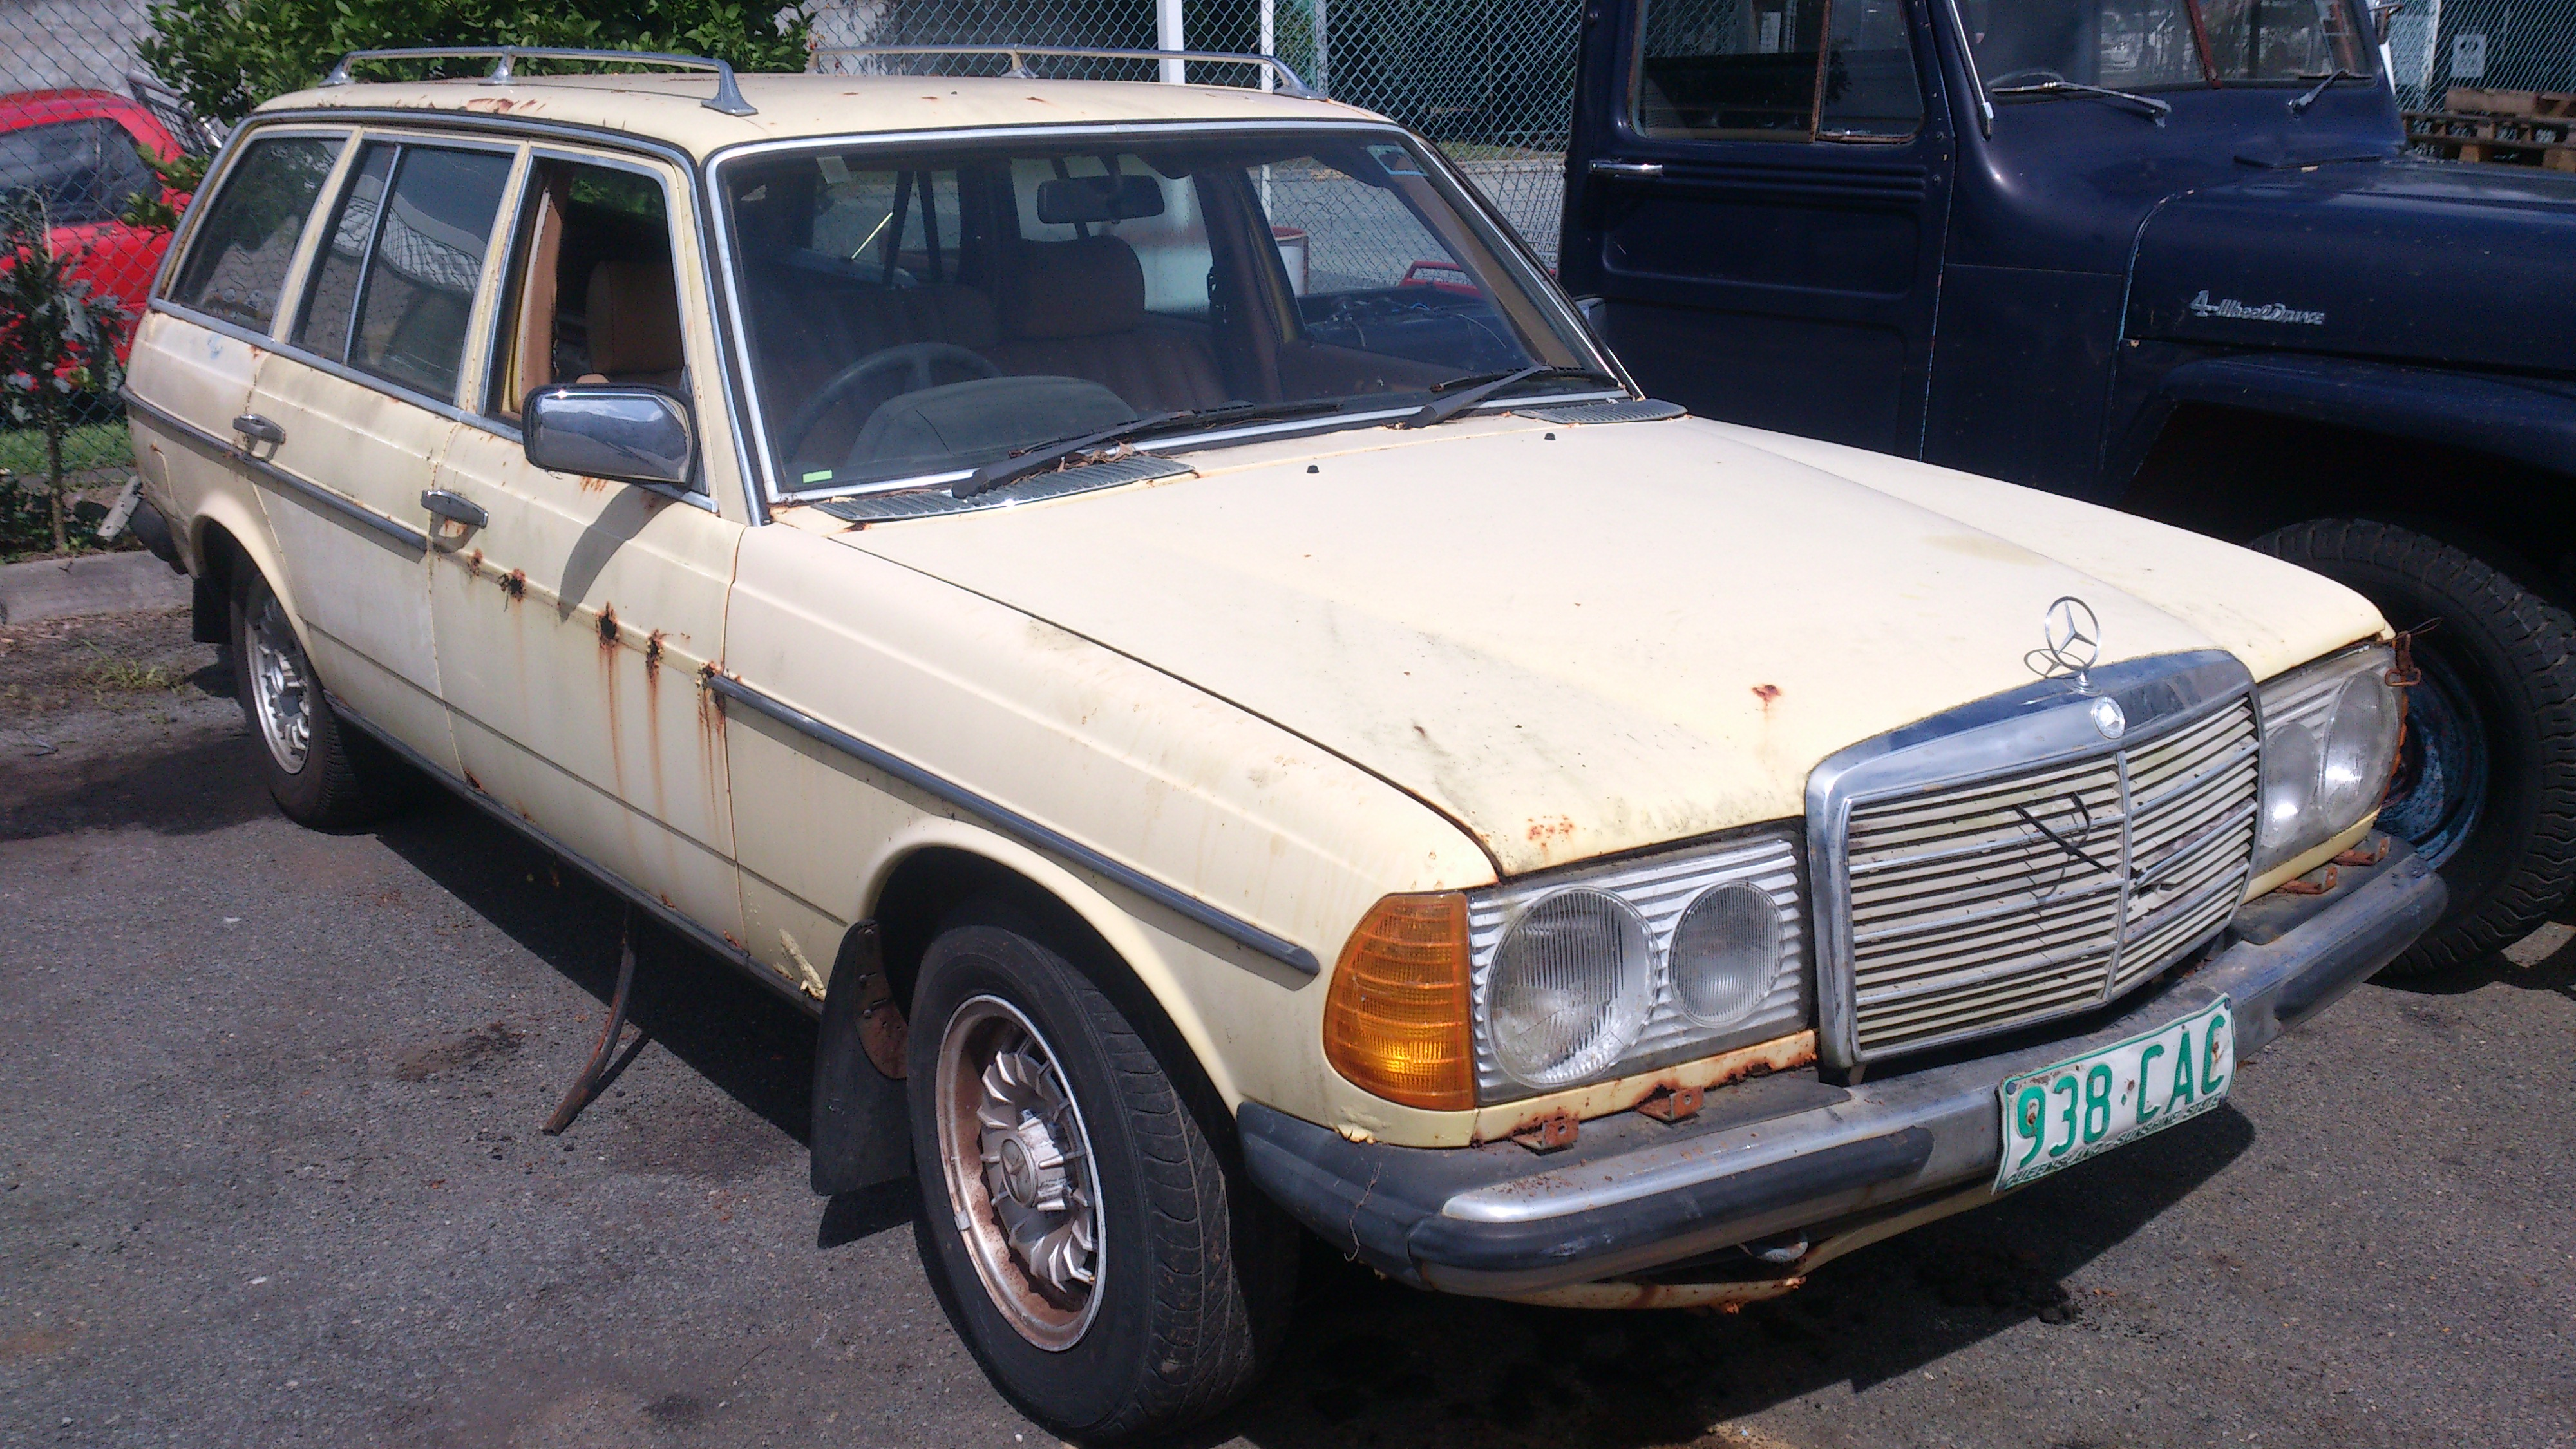 Mercedes 300d diesel 1980 wagon wrecking car parts qld for Mercedes benz 300d parts